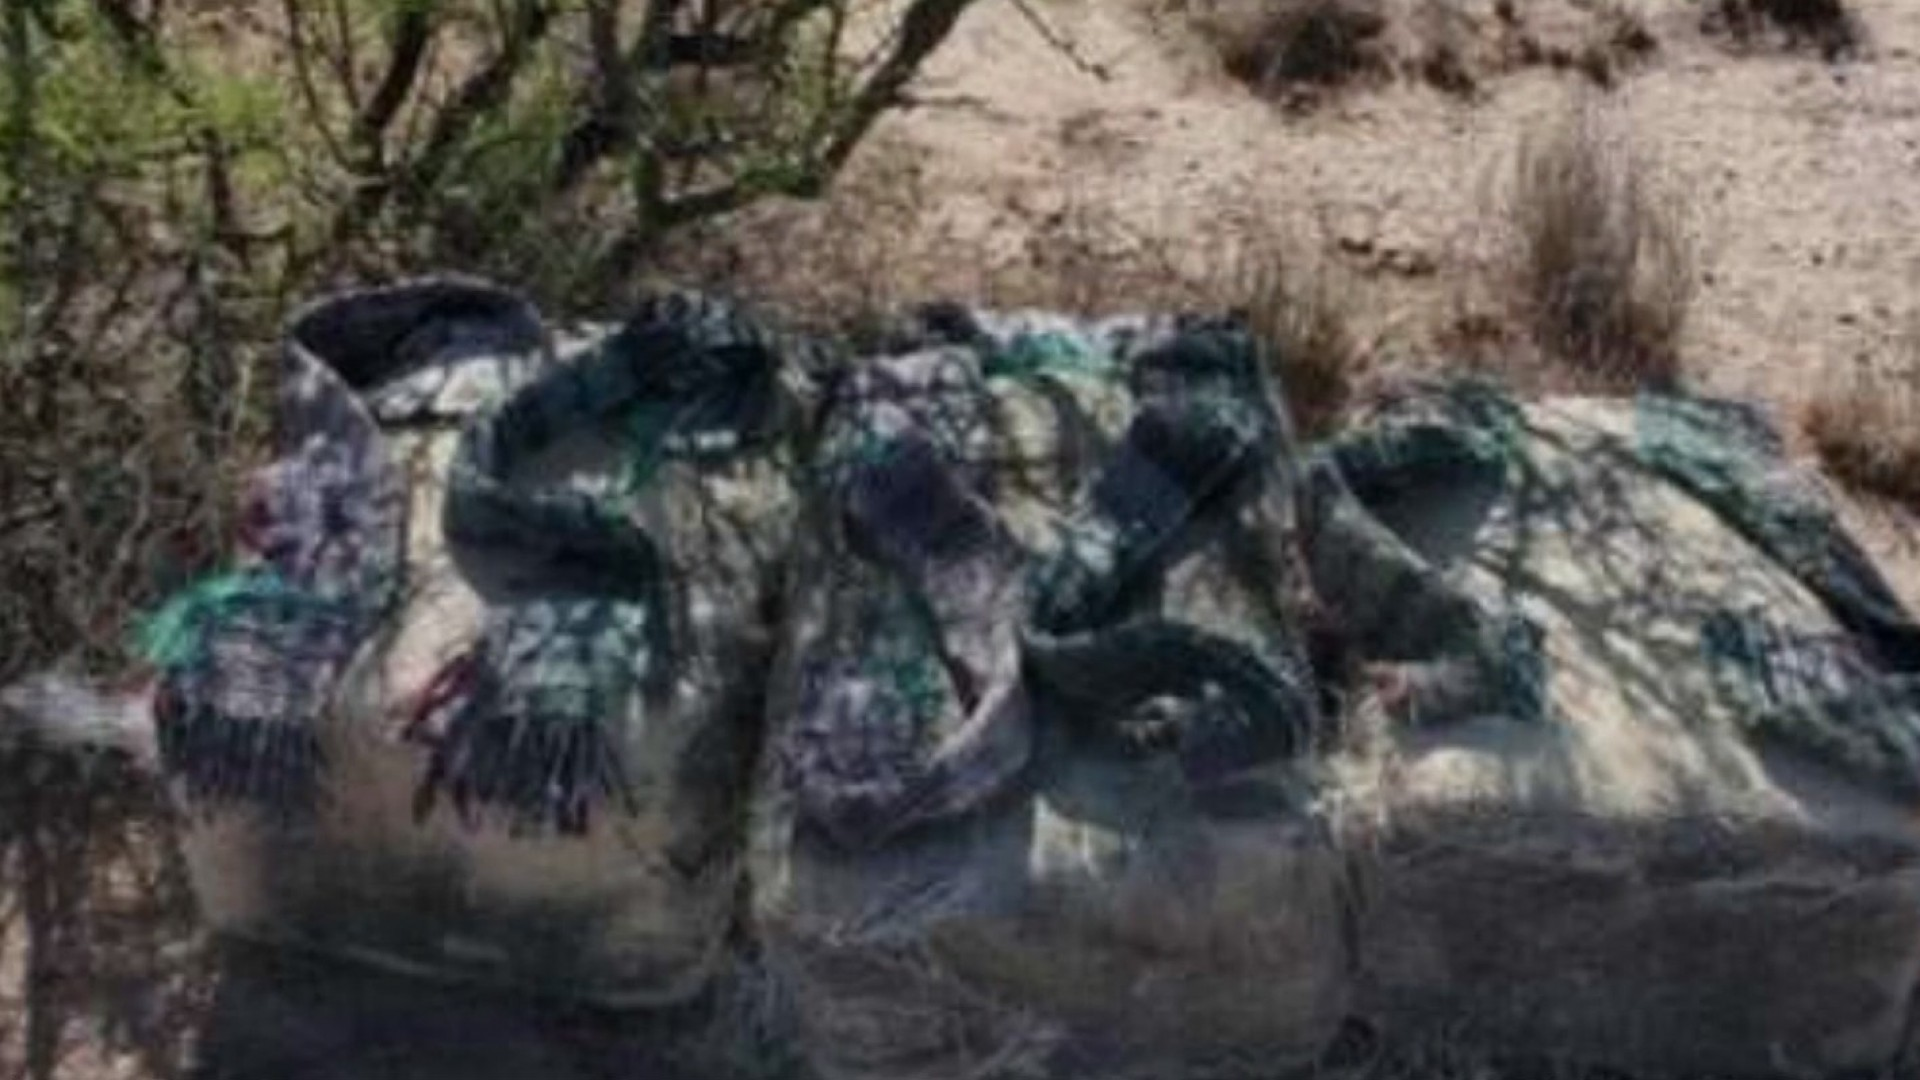 Border Patrol seizes 850 pounds of marijuana near Van Horn